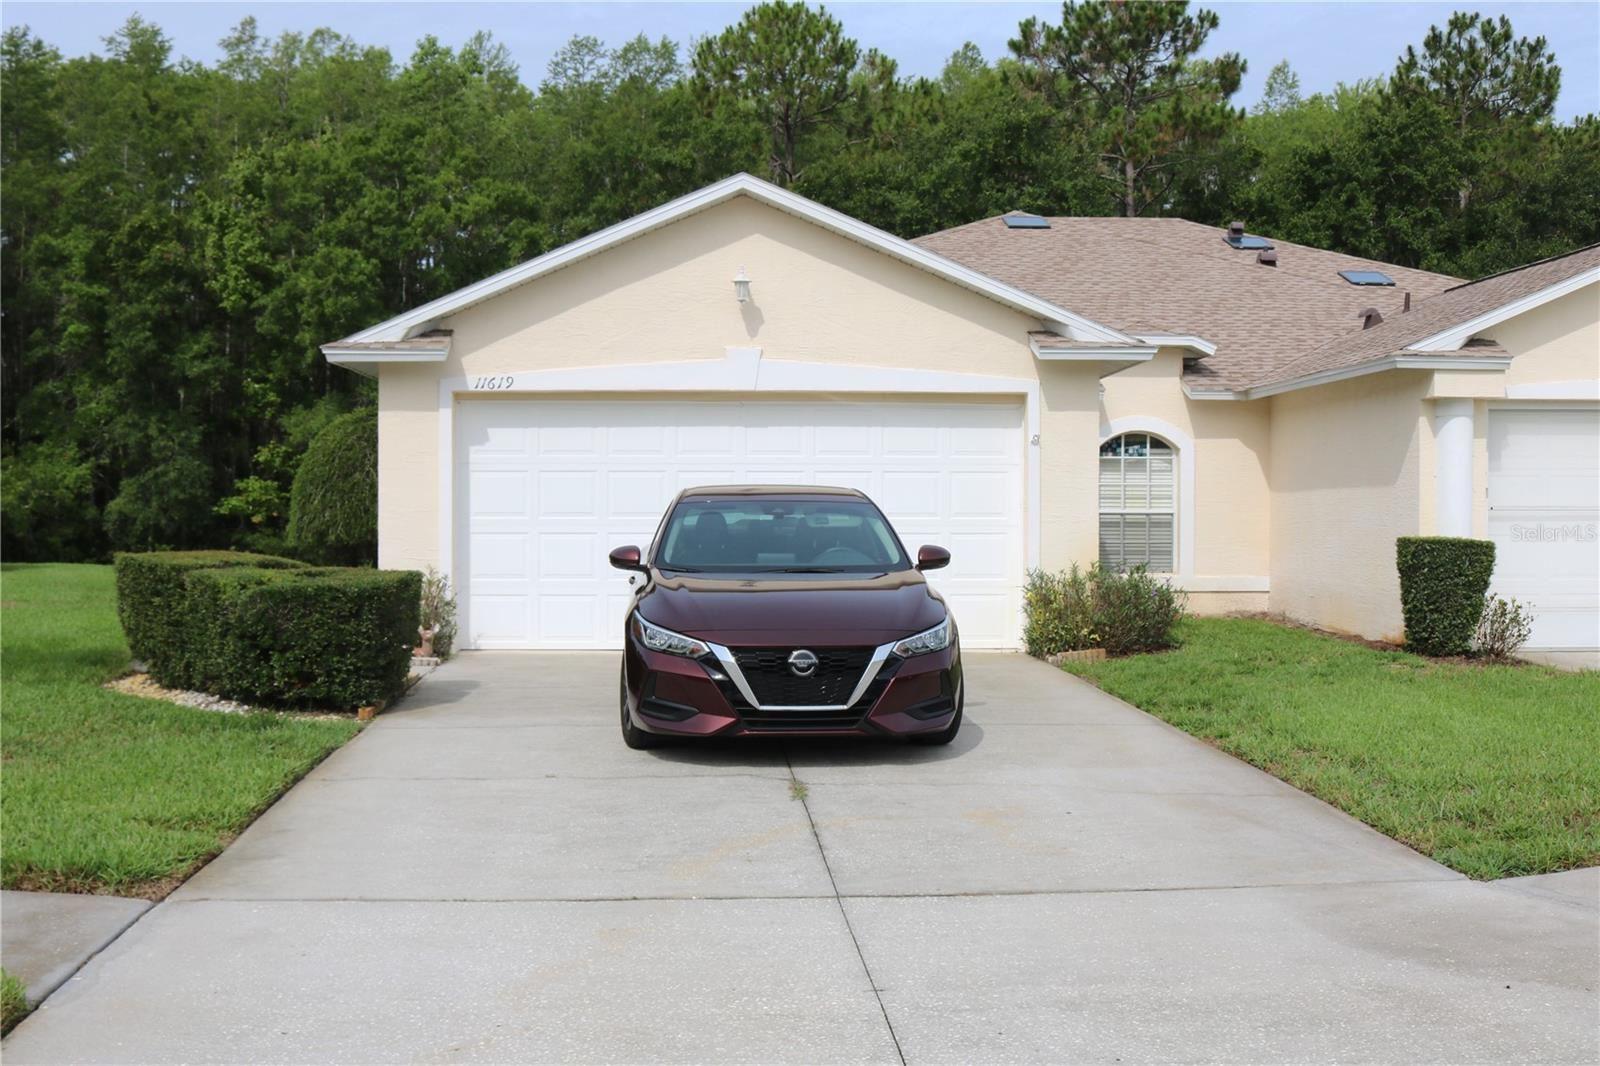 11619 FOXWORTH LANE, New Port Richey, FL 34654 - MLS#: W7834933